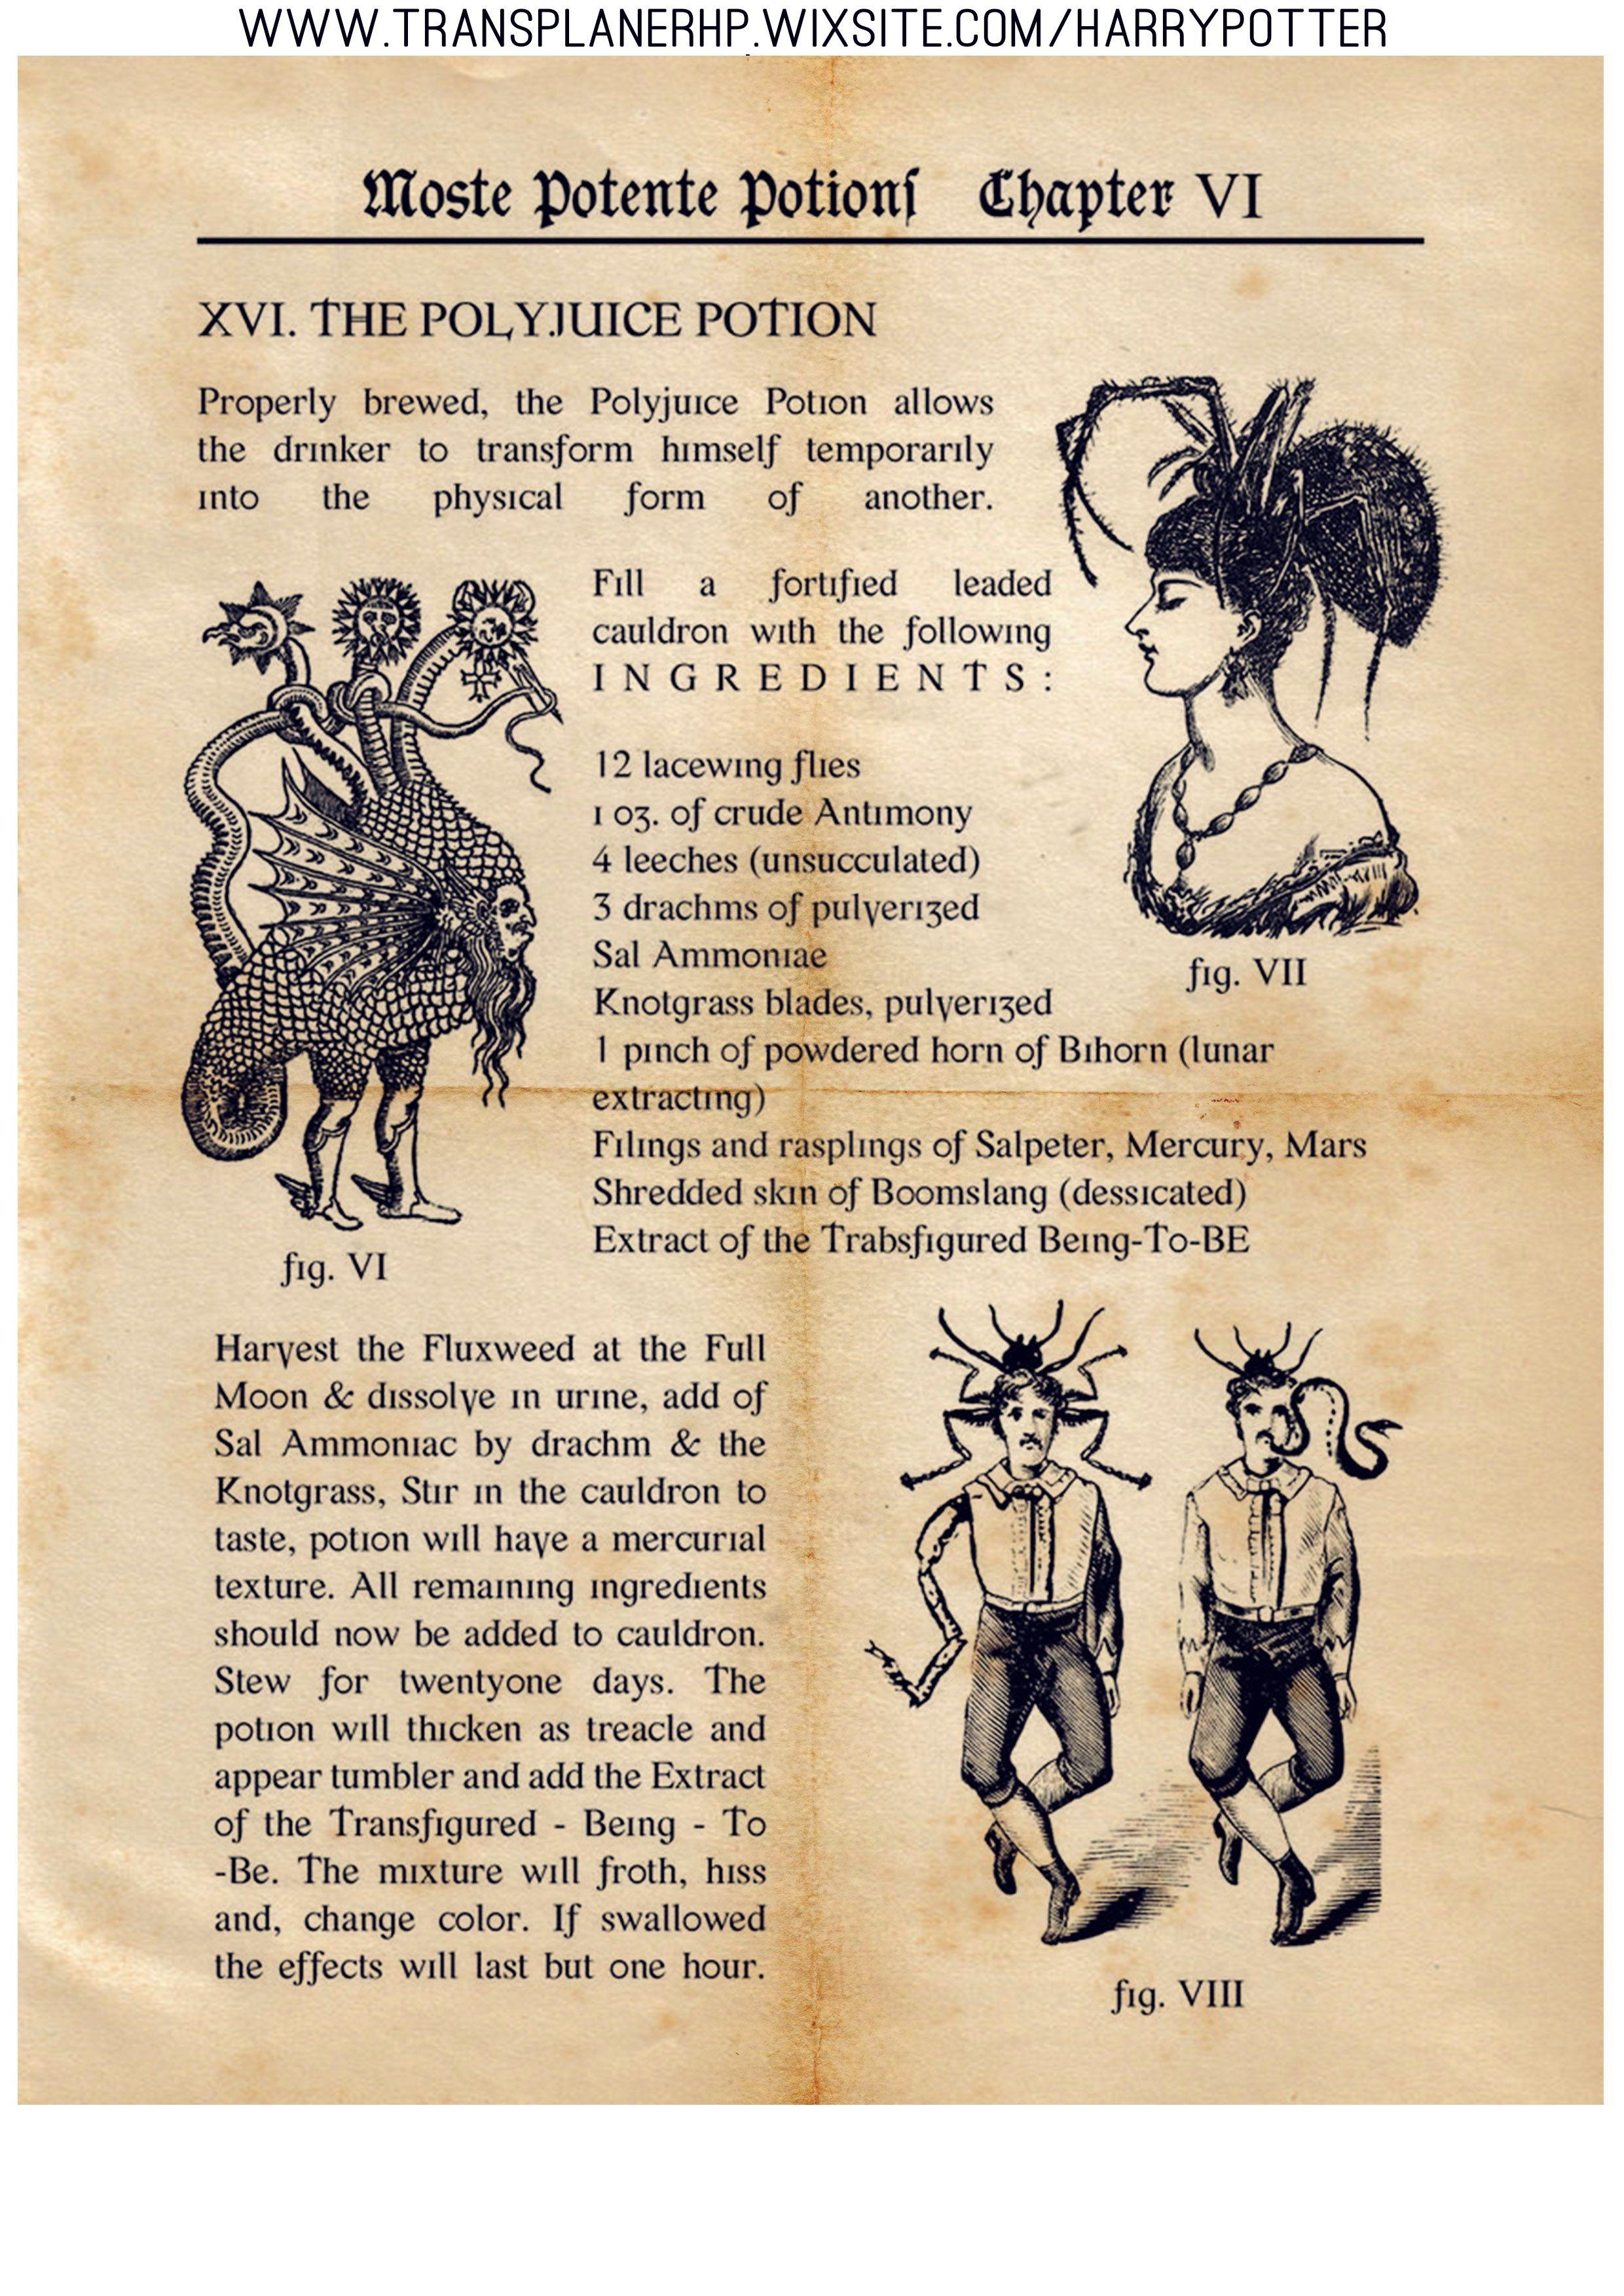 Livre De Potion Harry Potter : livre, potion, harry, potter, LIVRE, POTIONS, Illustrations, Harry, Potter,, Potions, Artisanat, Potter